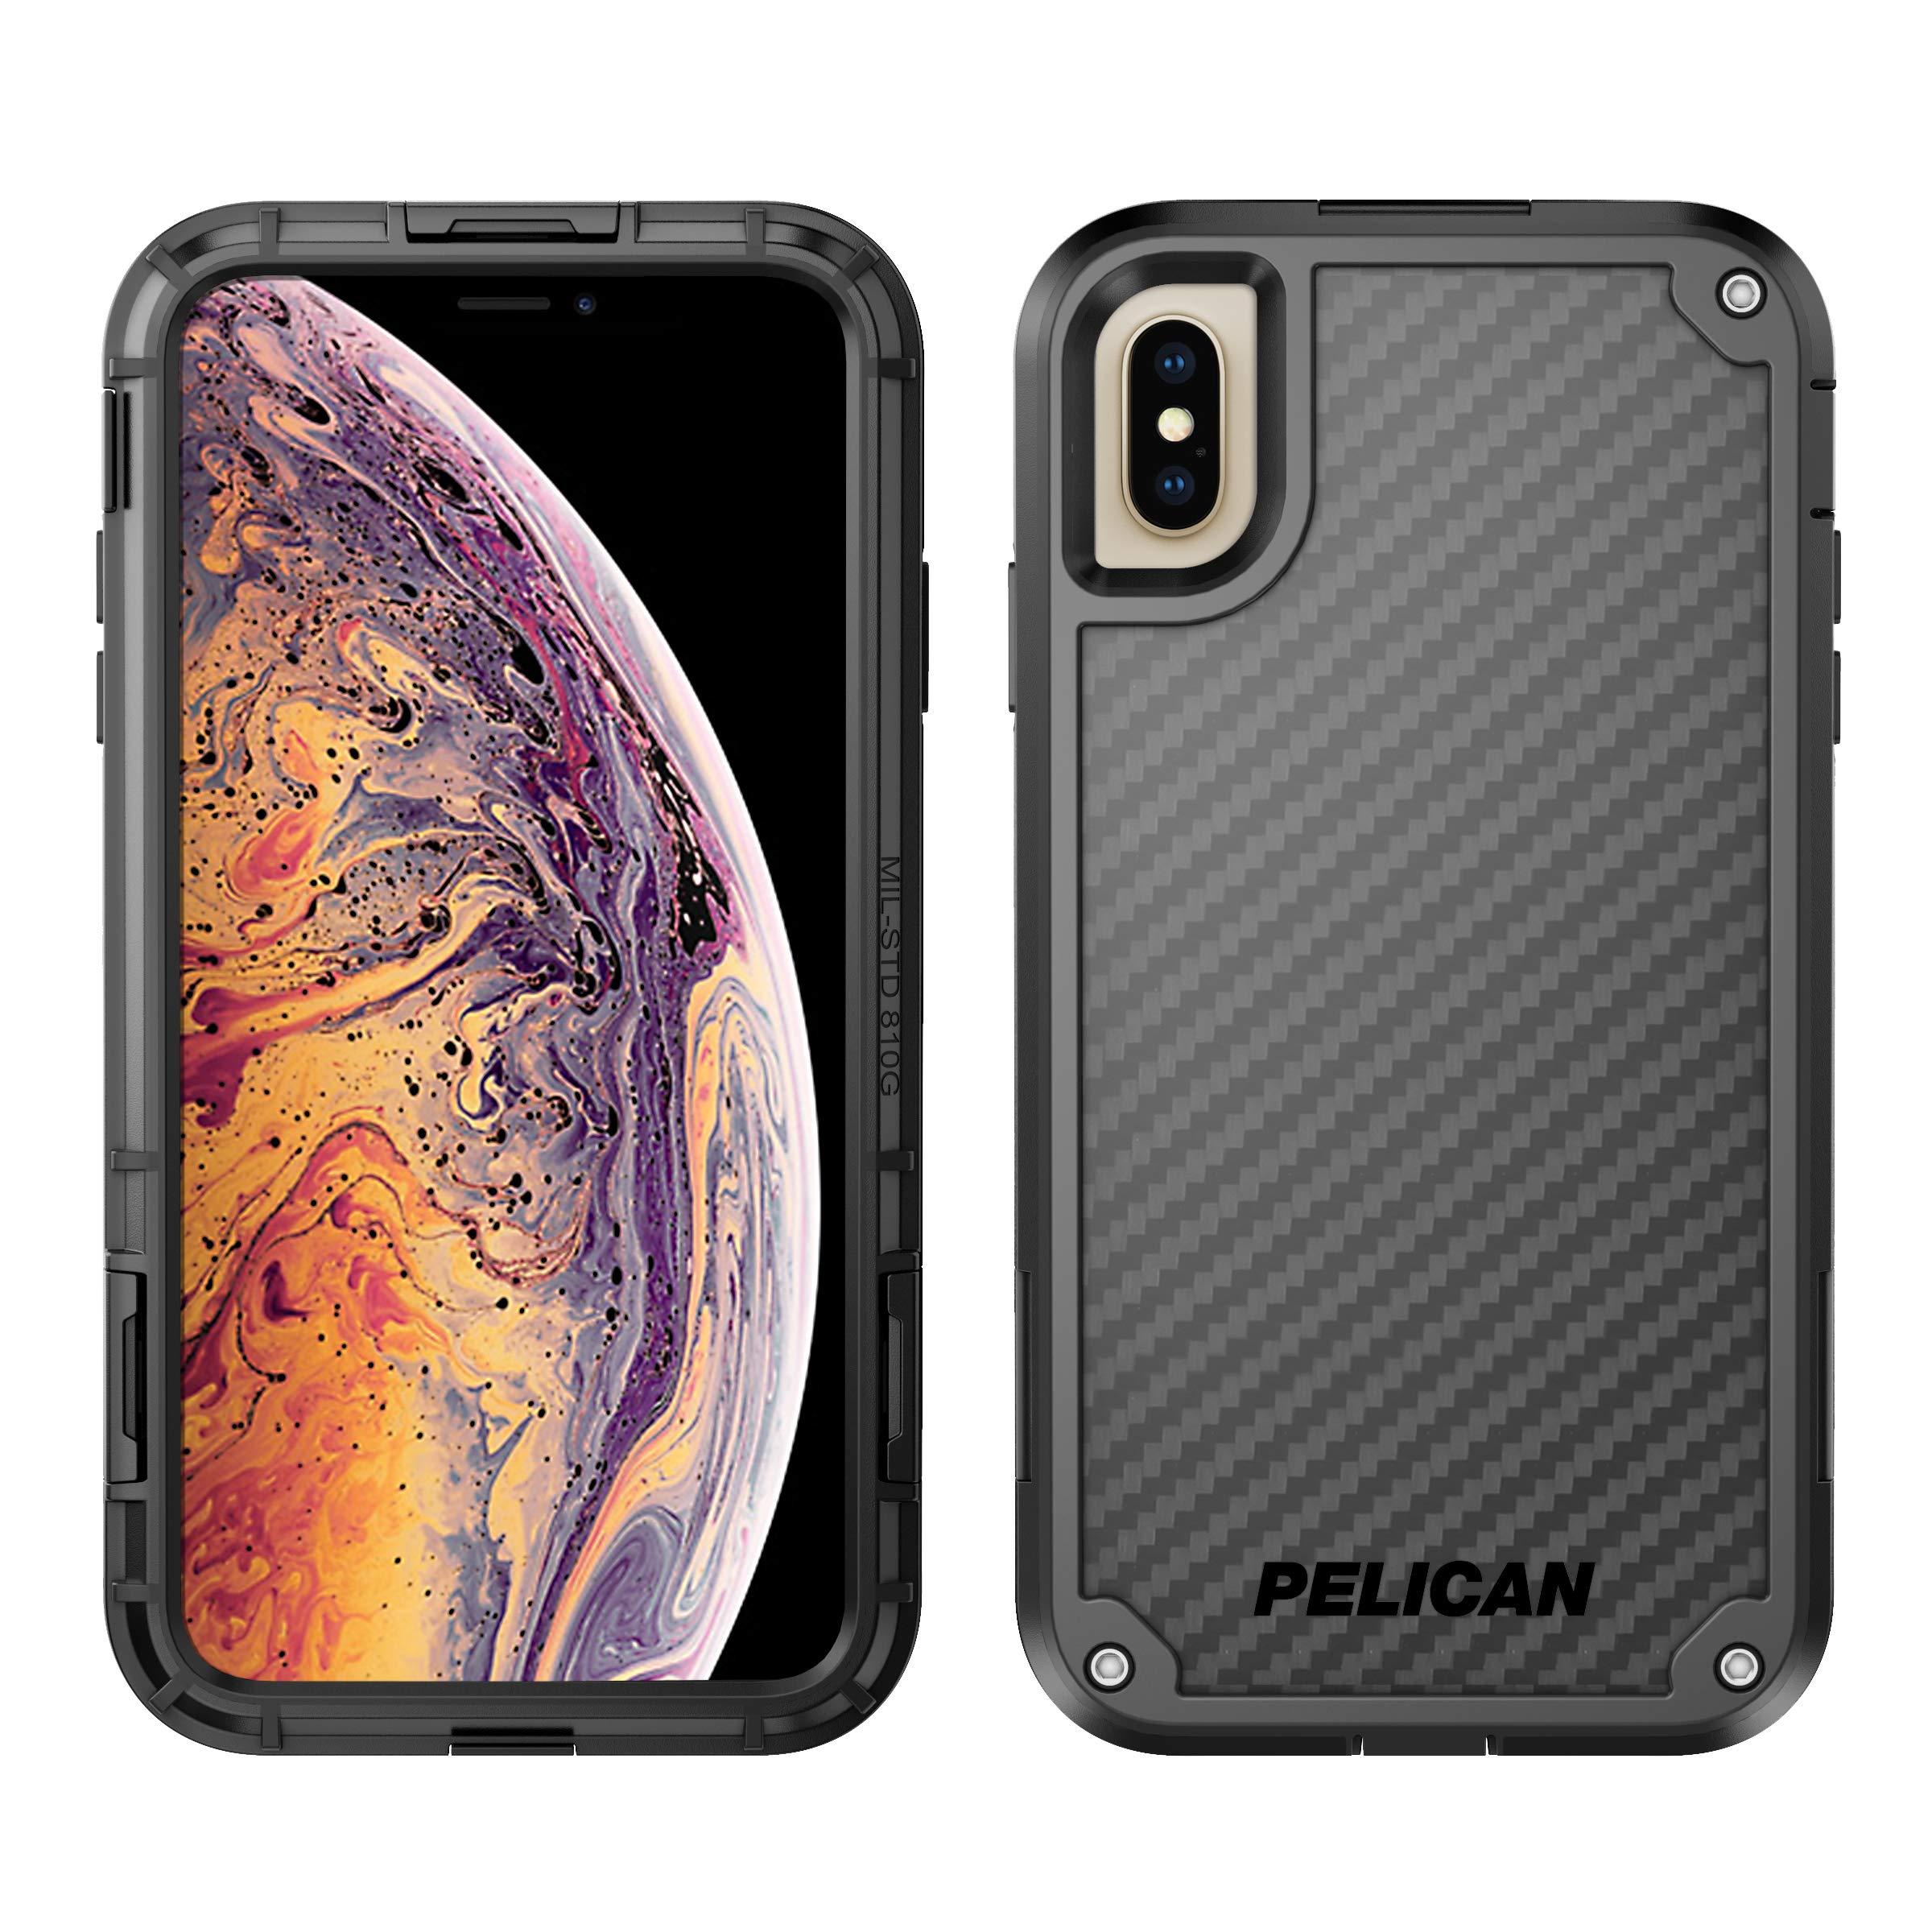 Pelican Shield iPhone XS Max Case with Kevlar brand fibers (Black)